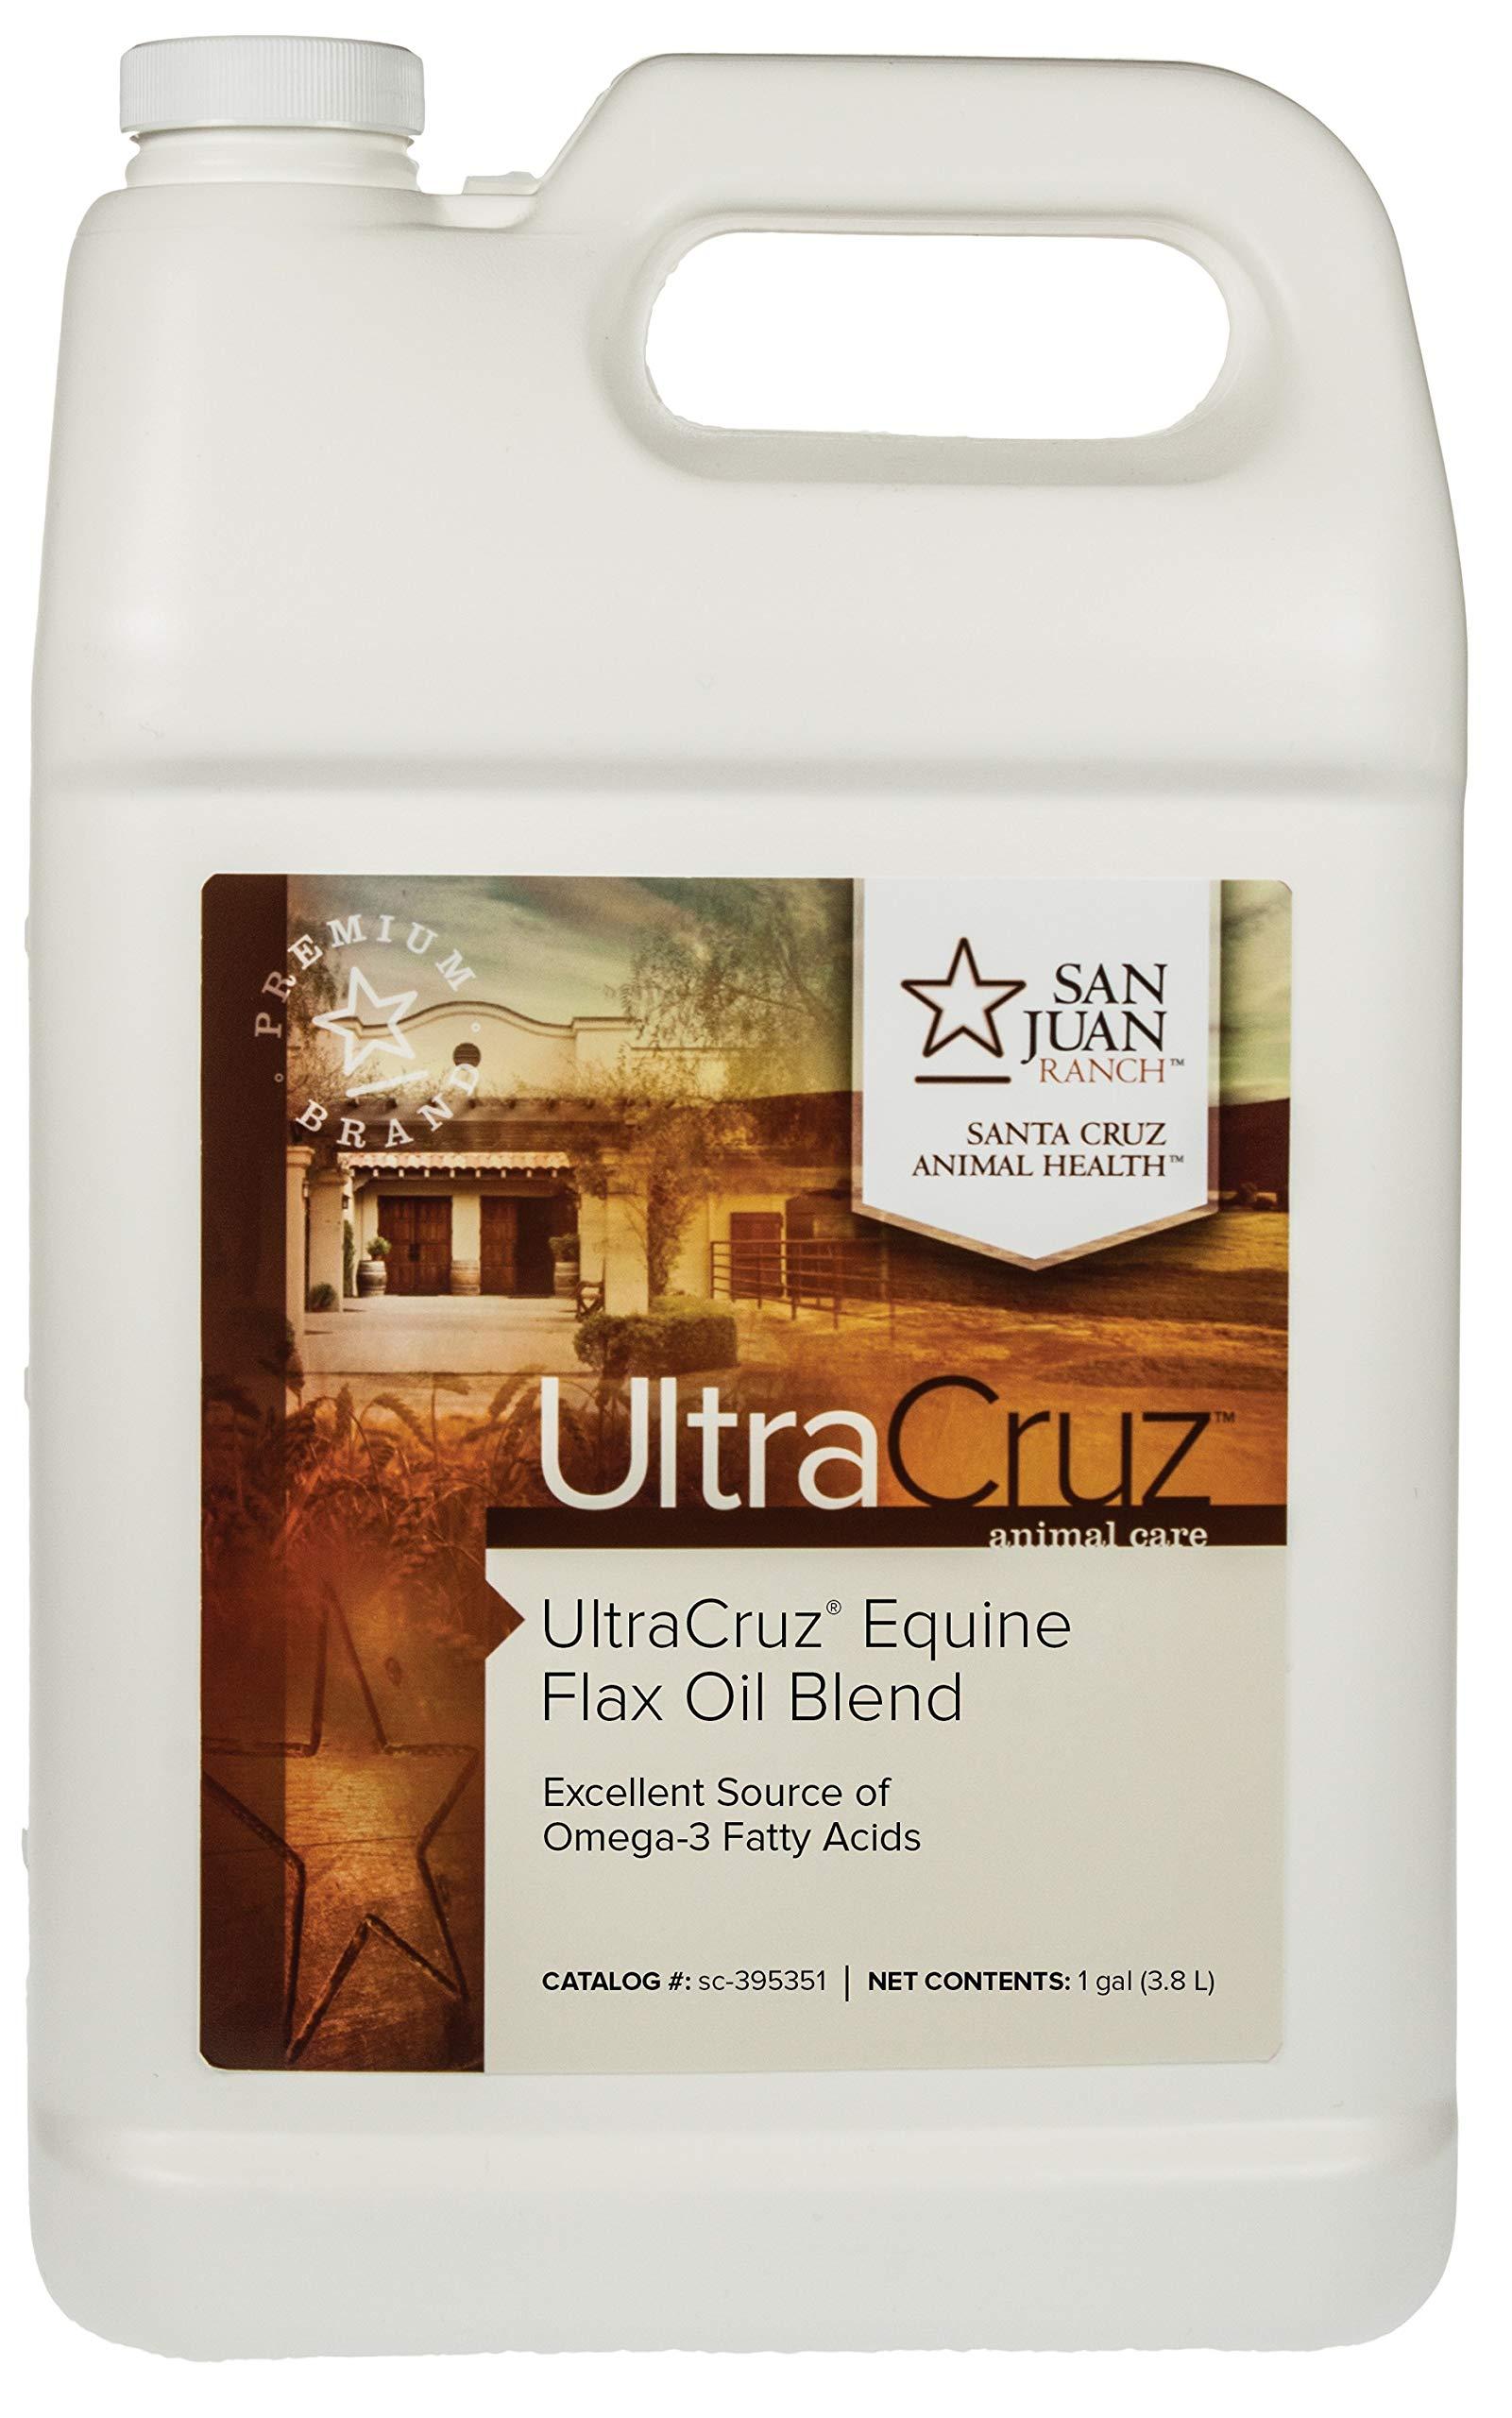 UltraCruz Flax Oil Blend Supplement for Horses and Livestock, 1 gal